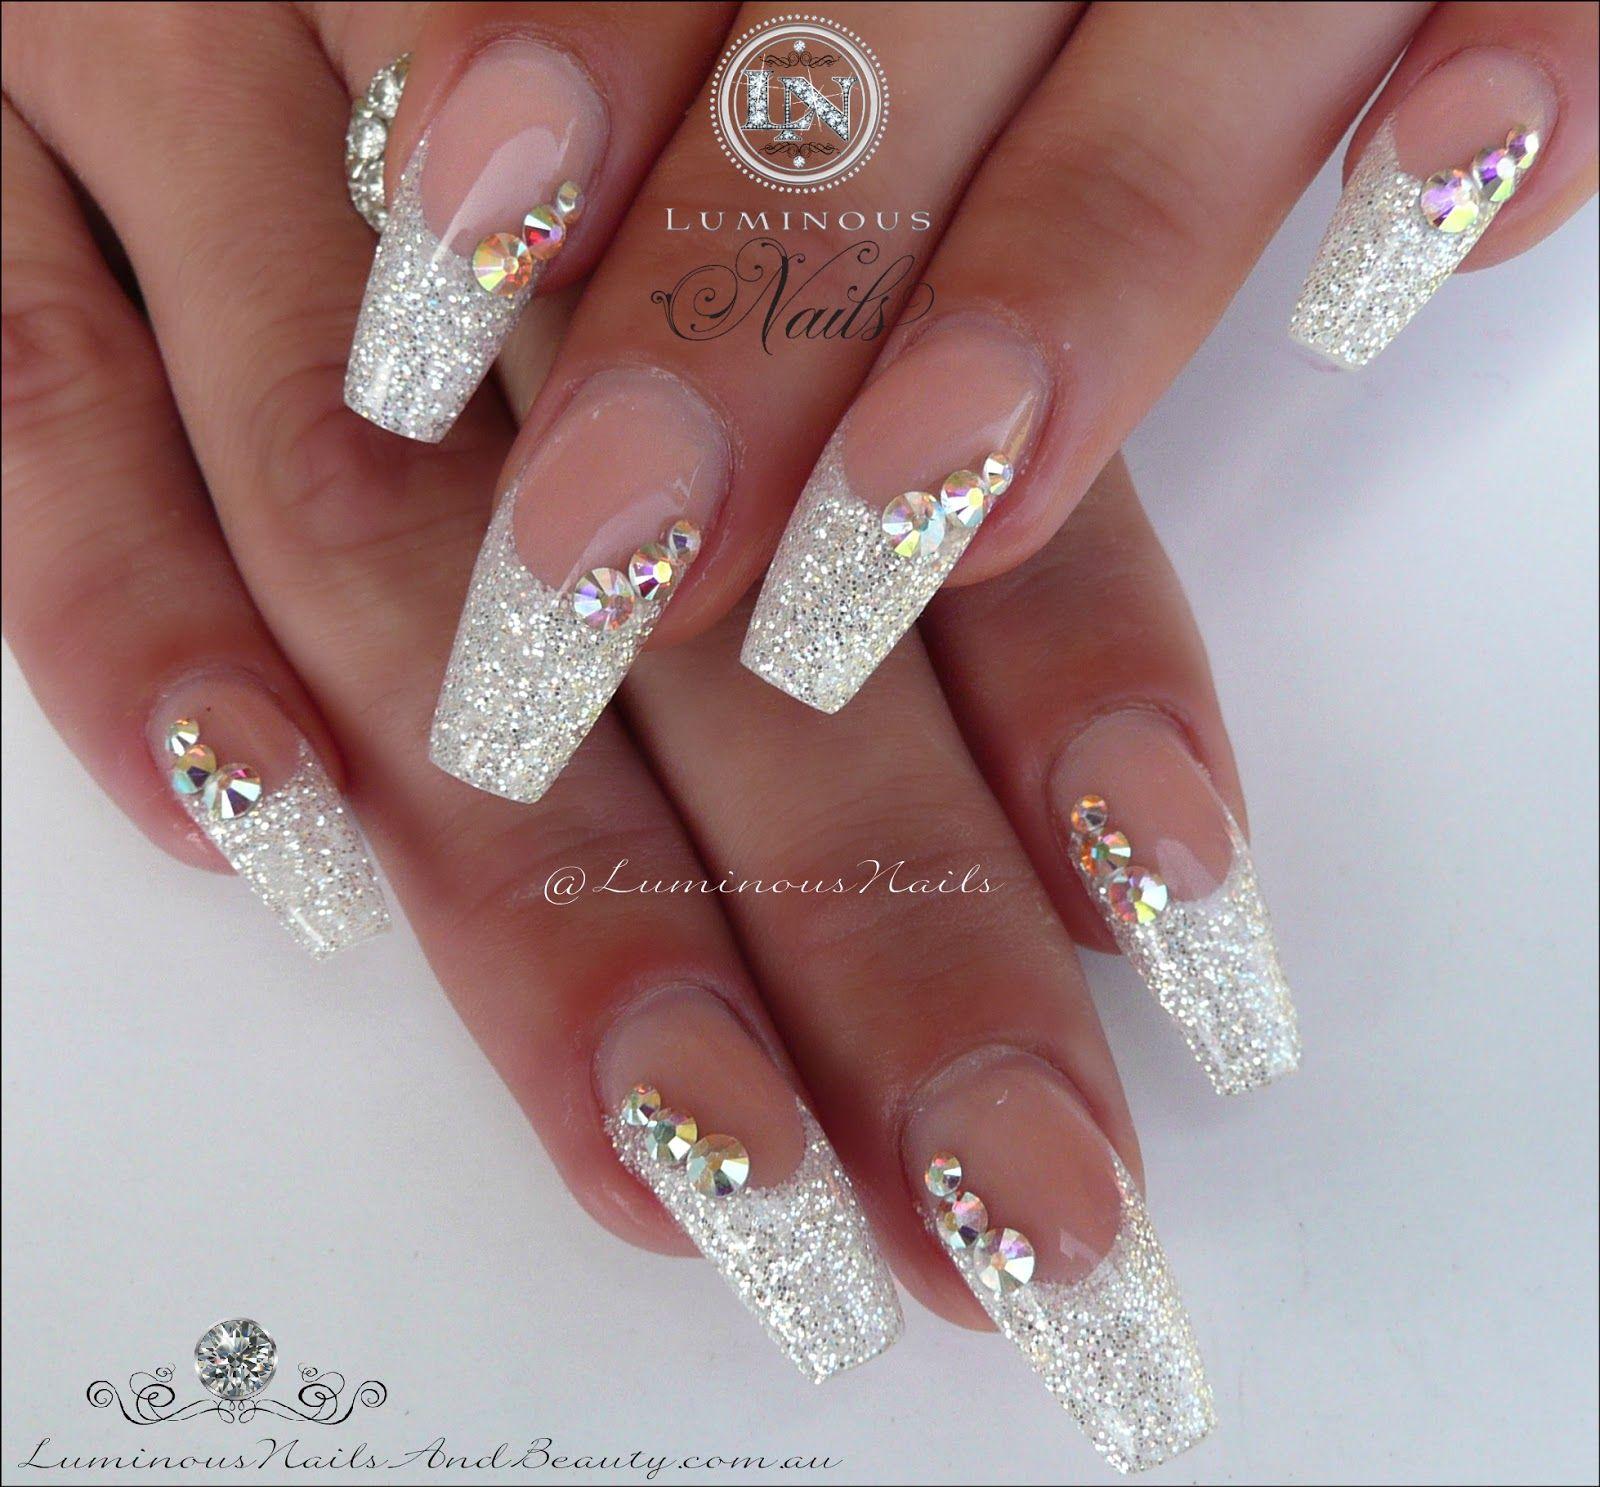 Pin by Terrell Schlundt on Wedding   Pinterest   Nail nail, Acrylic ...